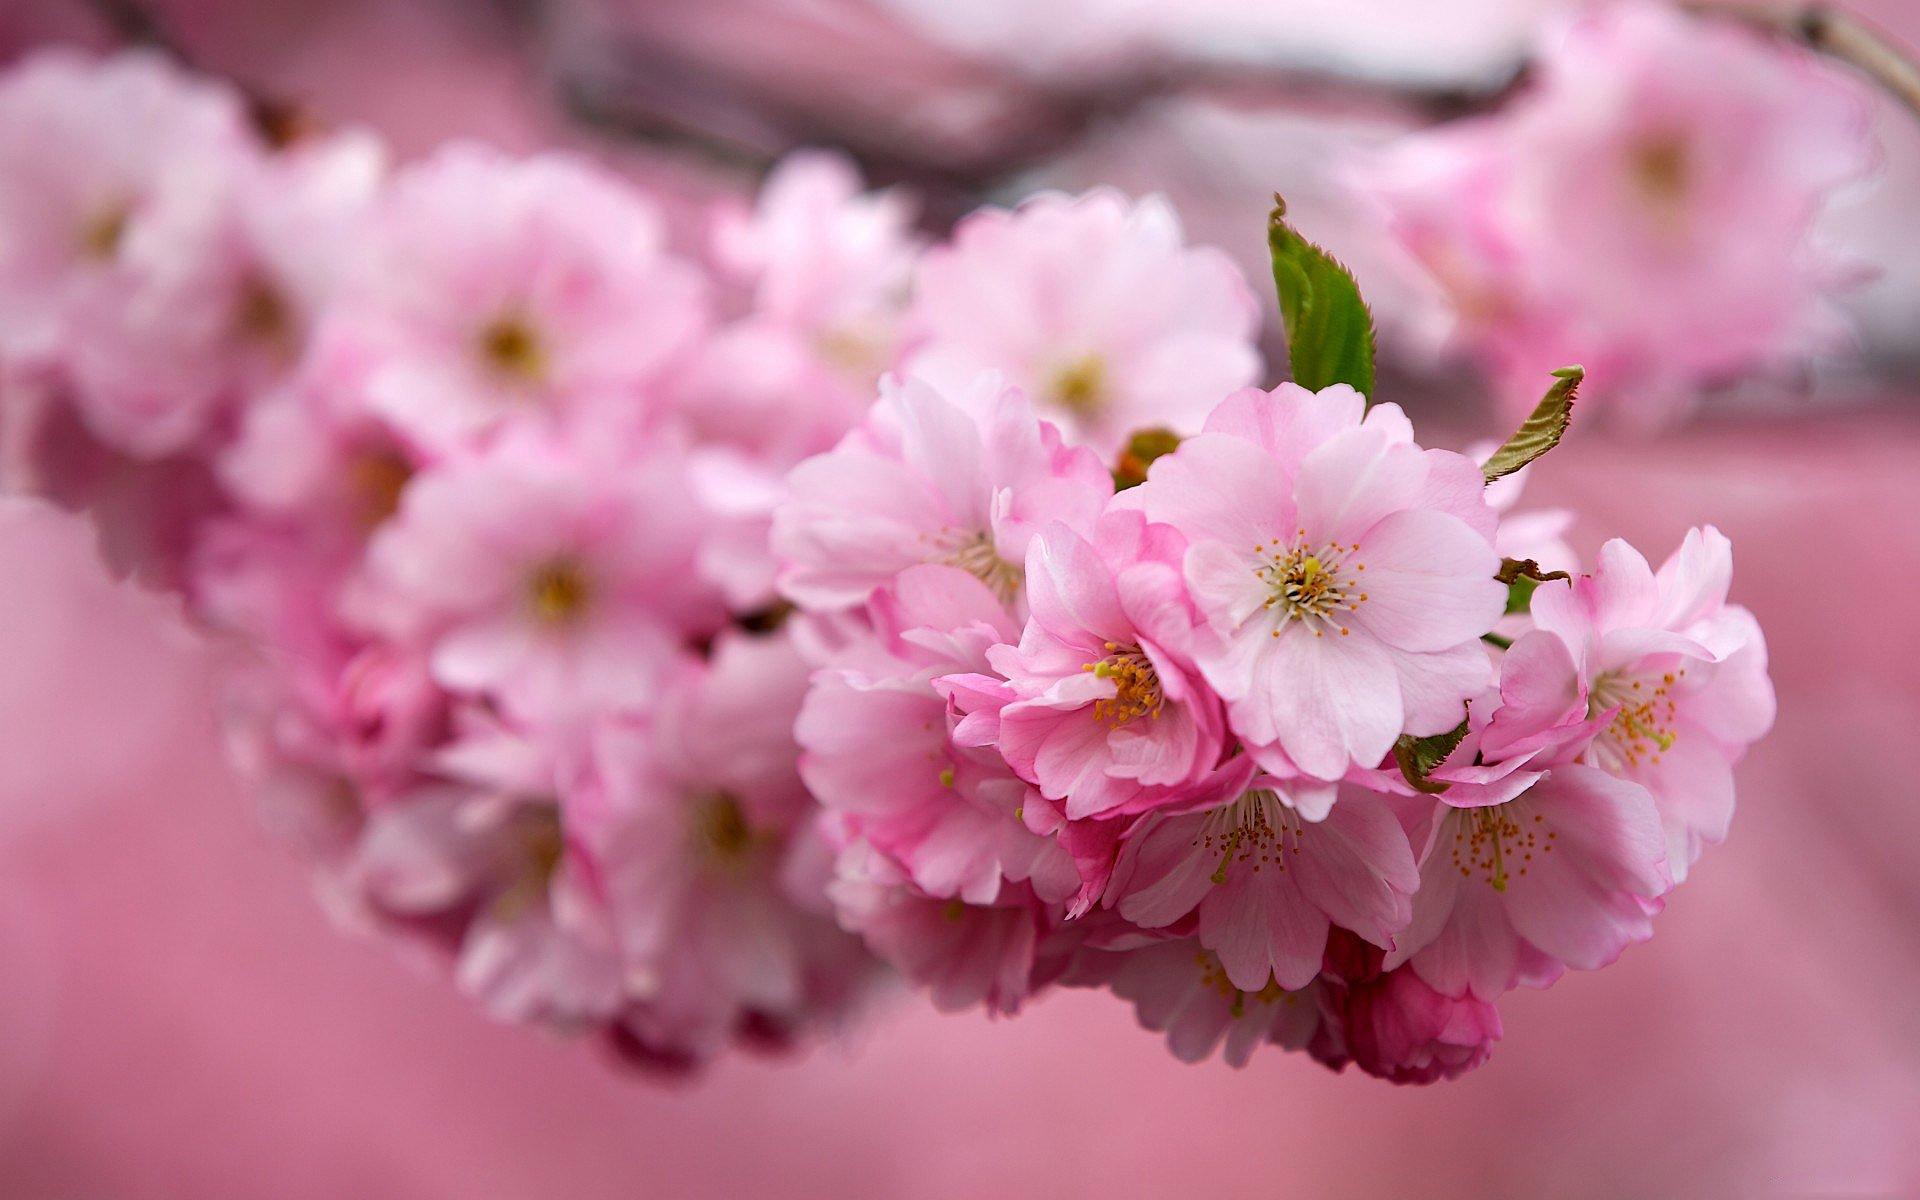 Подставки для цветов из дерева фото